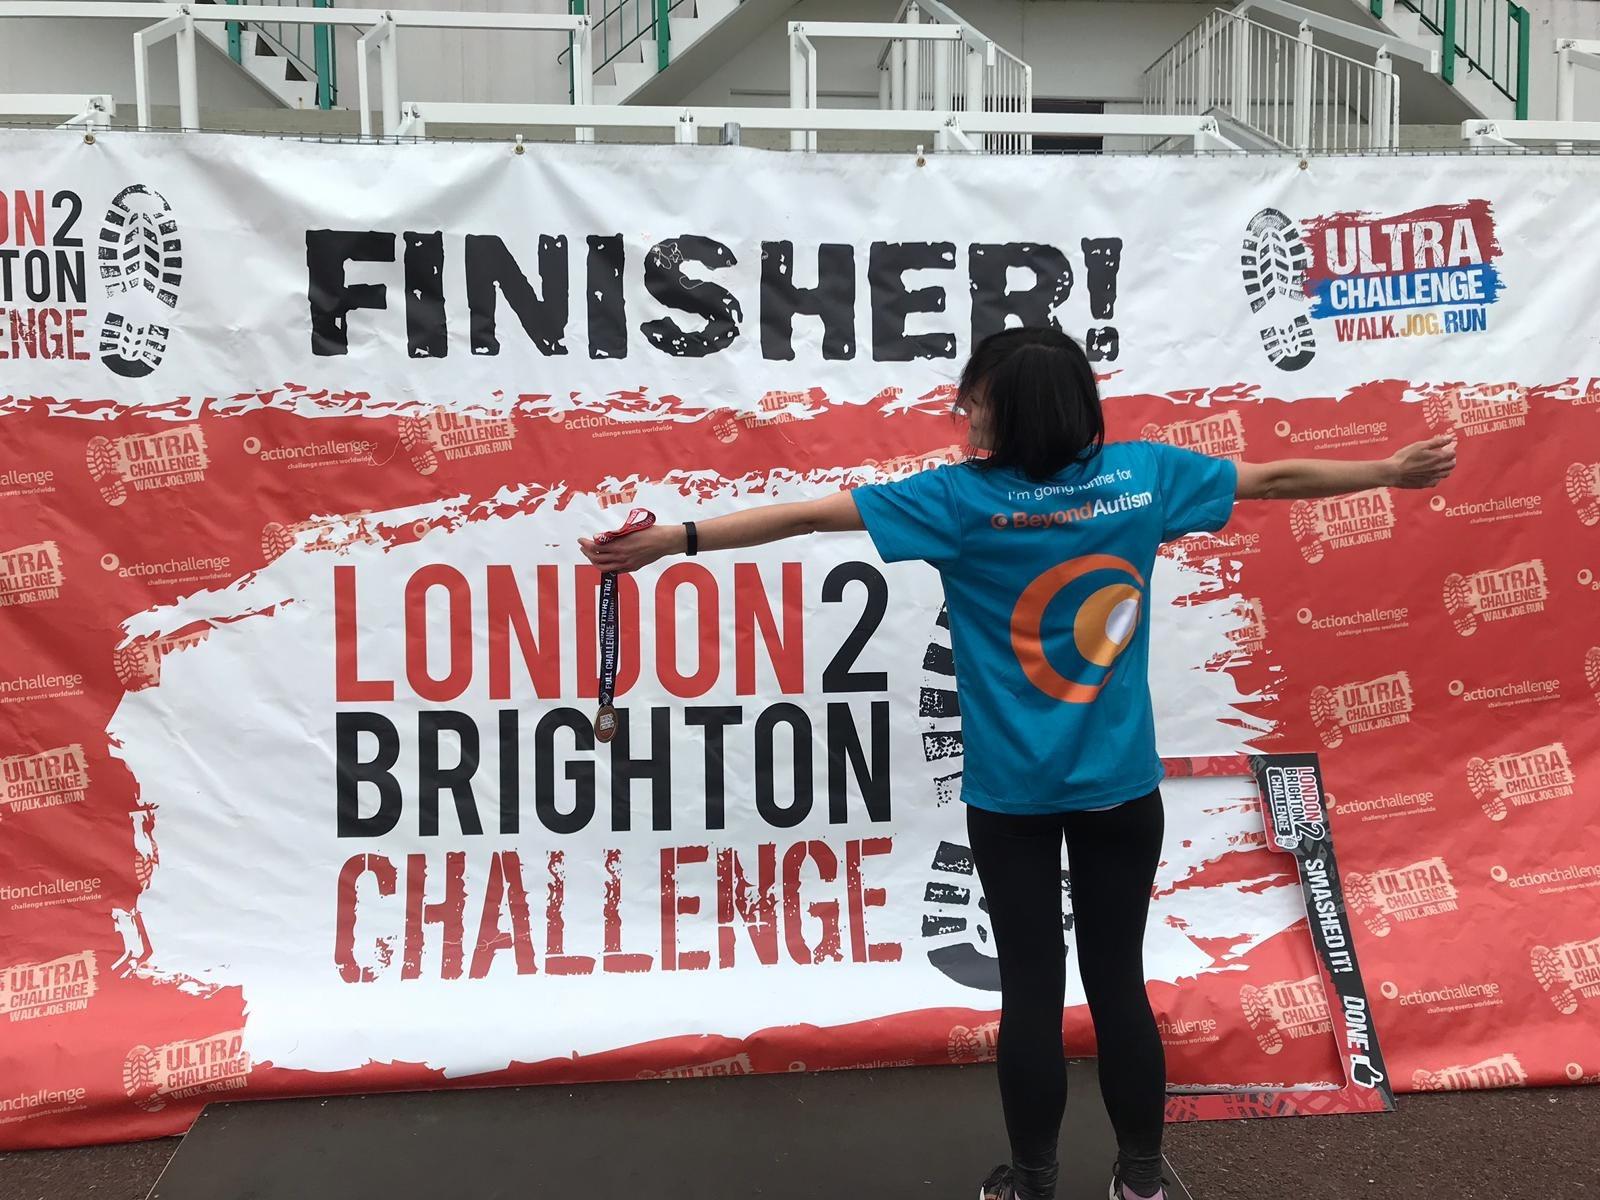 London 2 Brighton finisher